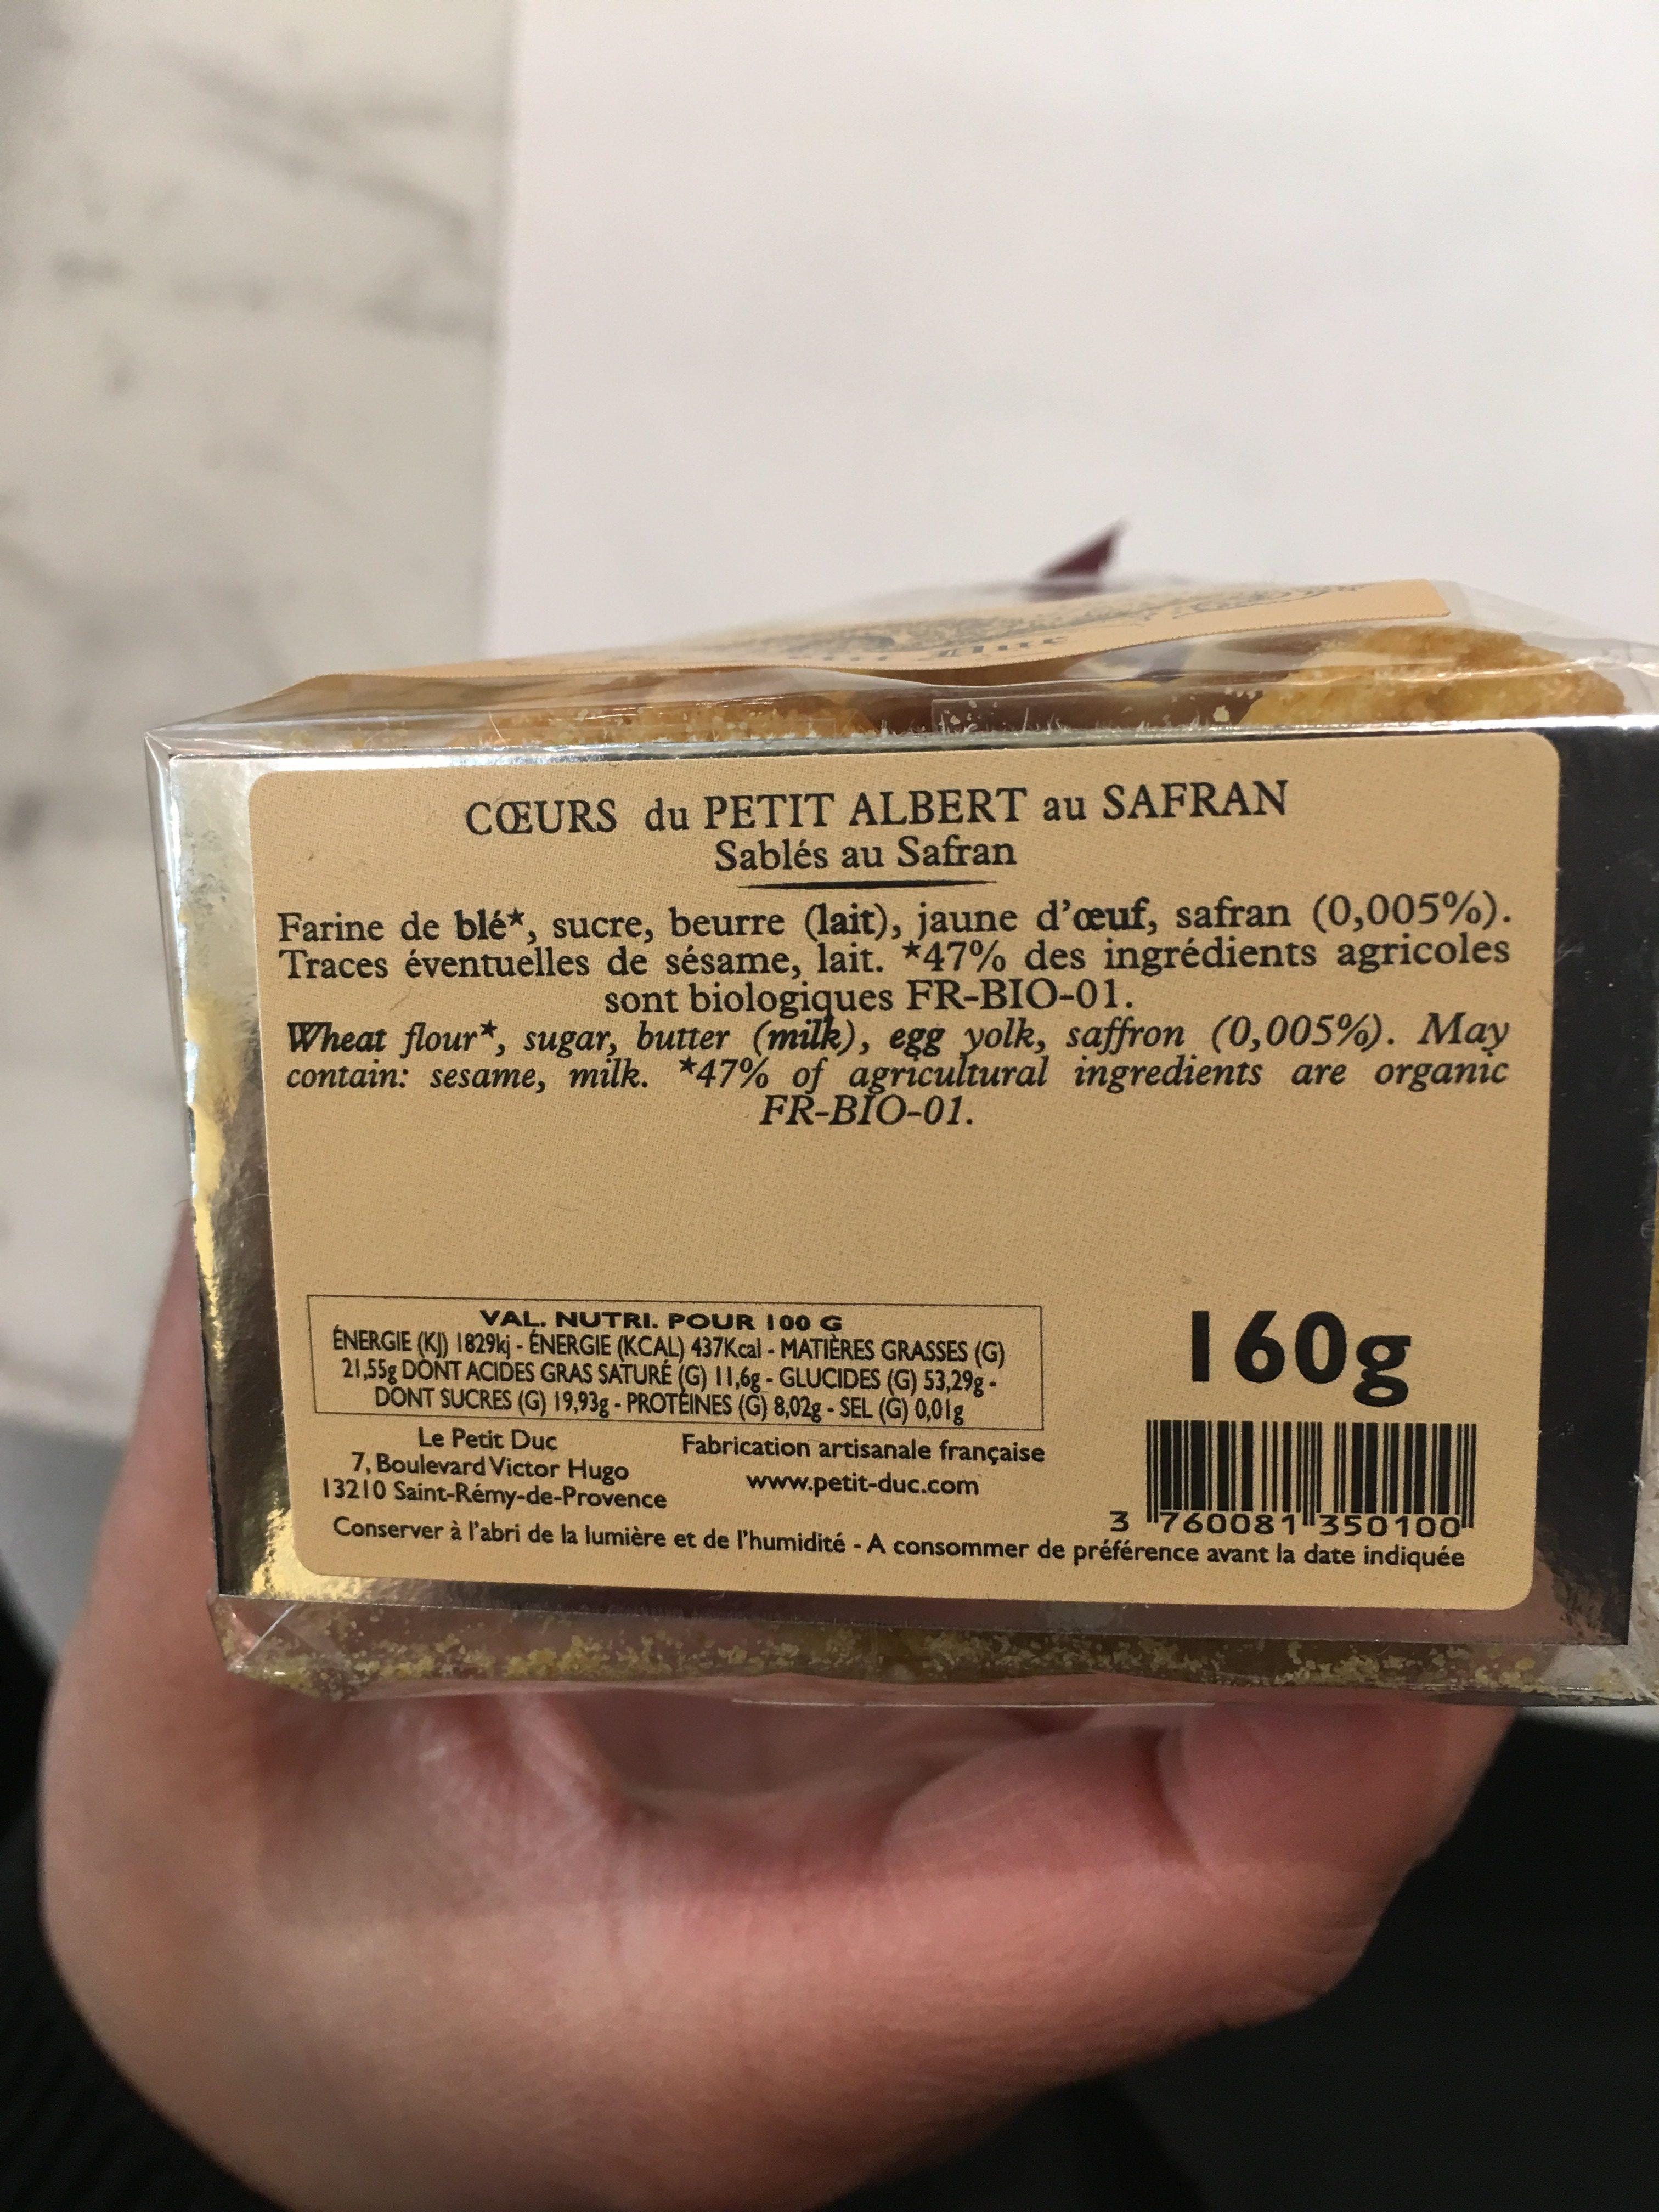 Coeur du PETIT ALBERT au safran - Ingrédients